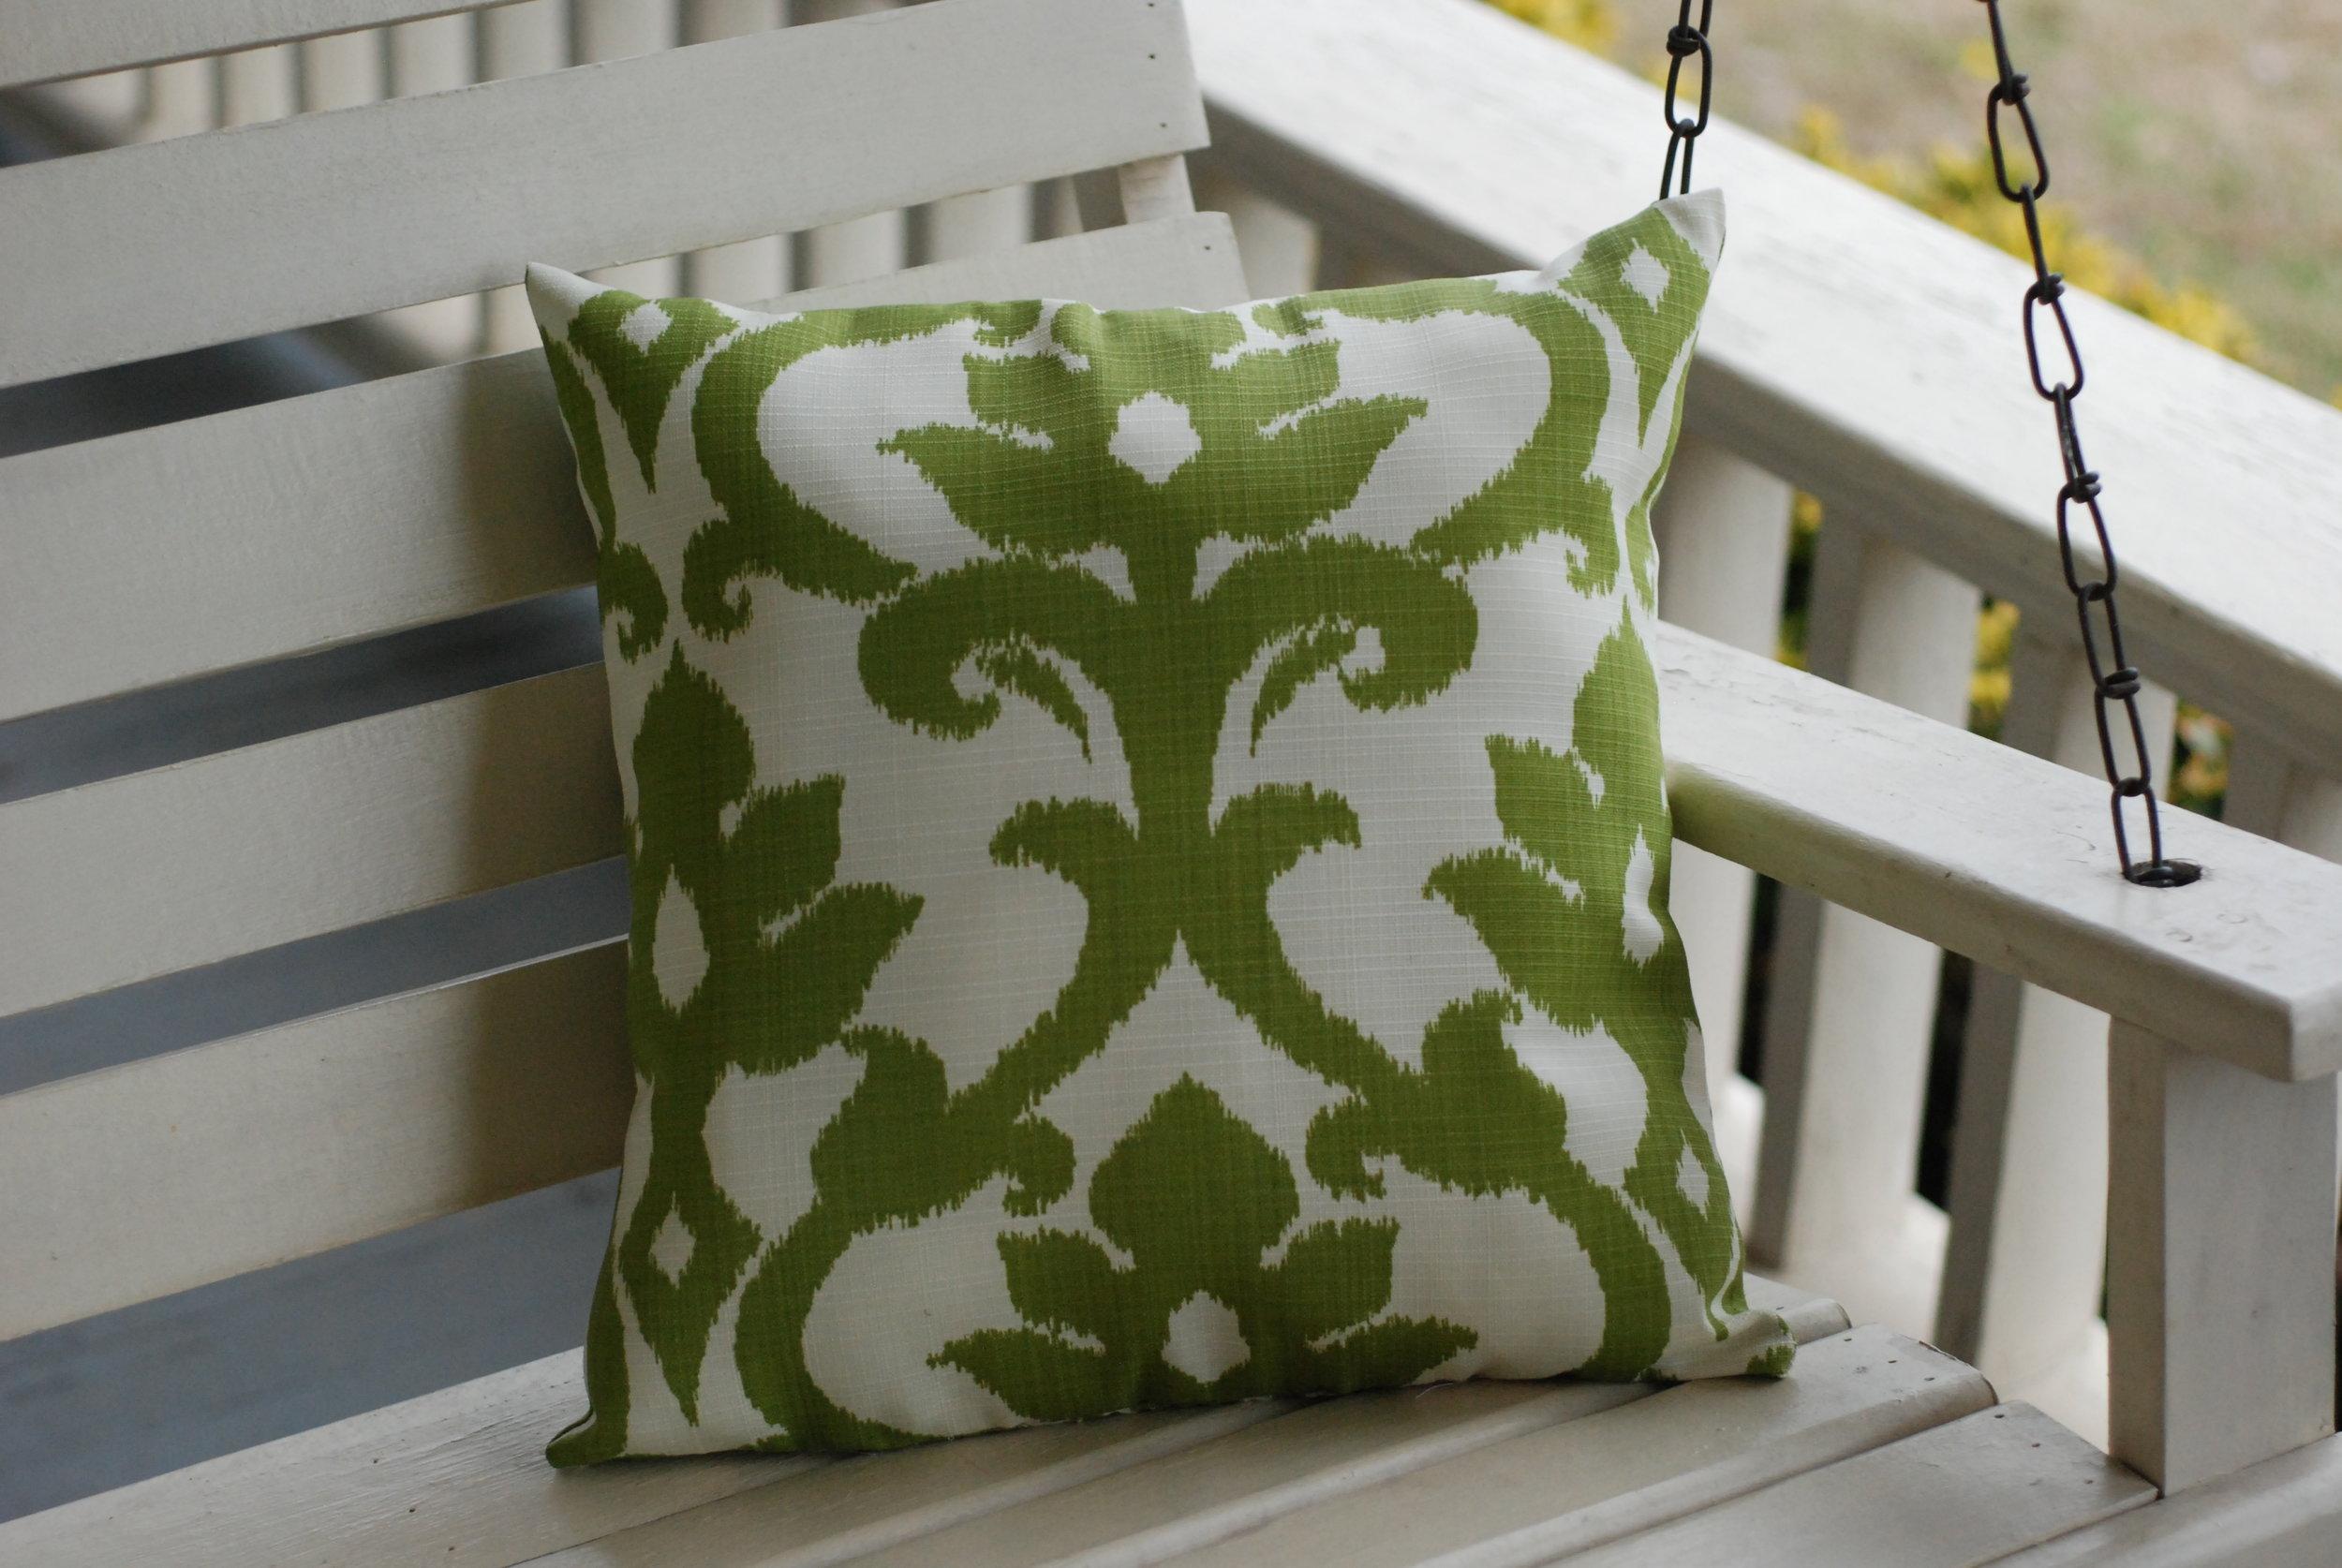 Enjoy your beautiful, handmade pillow!